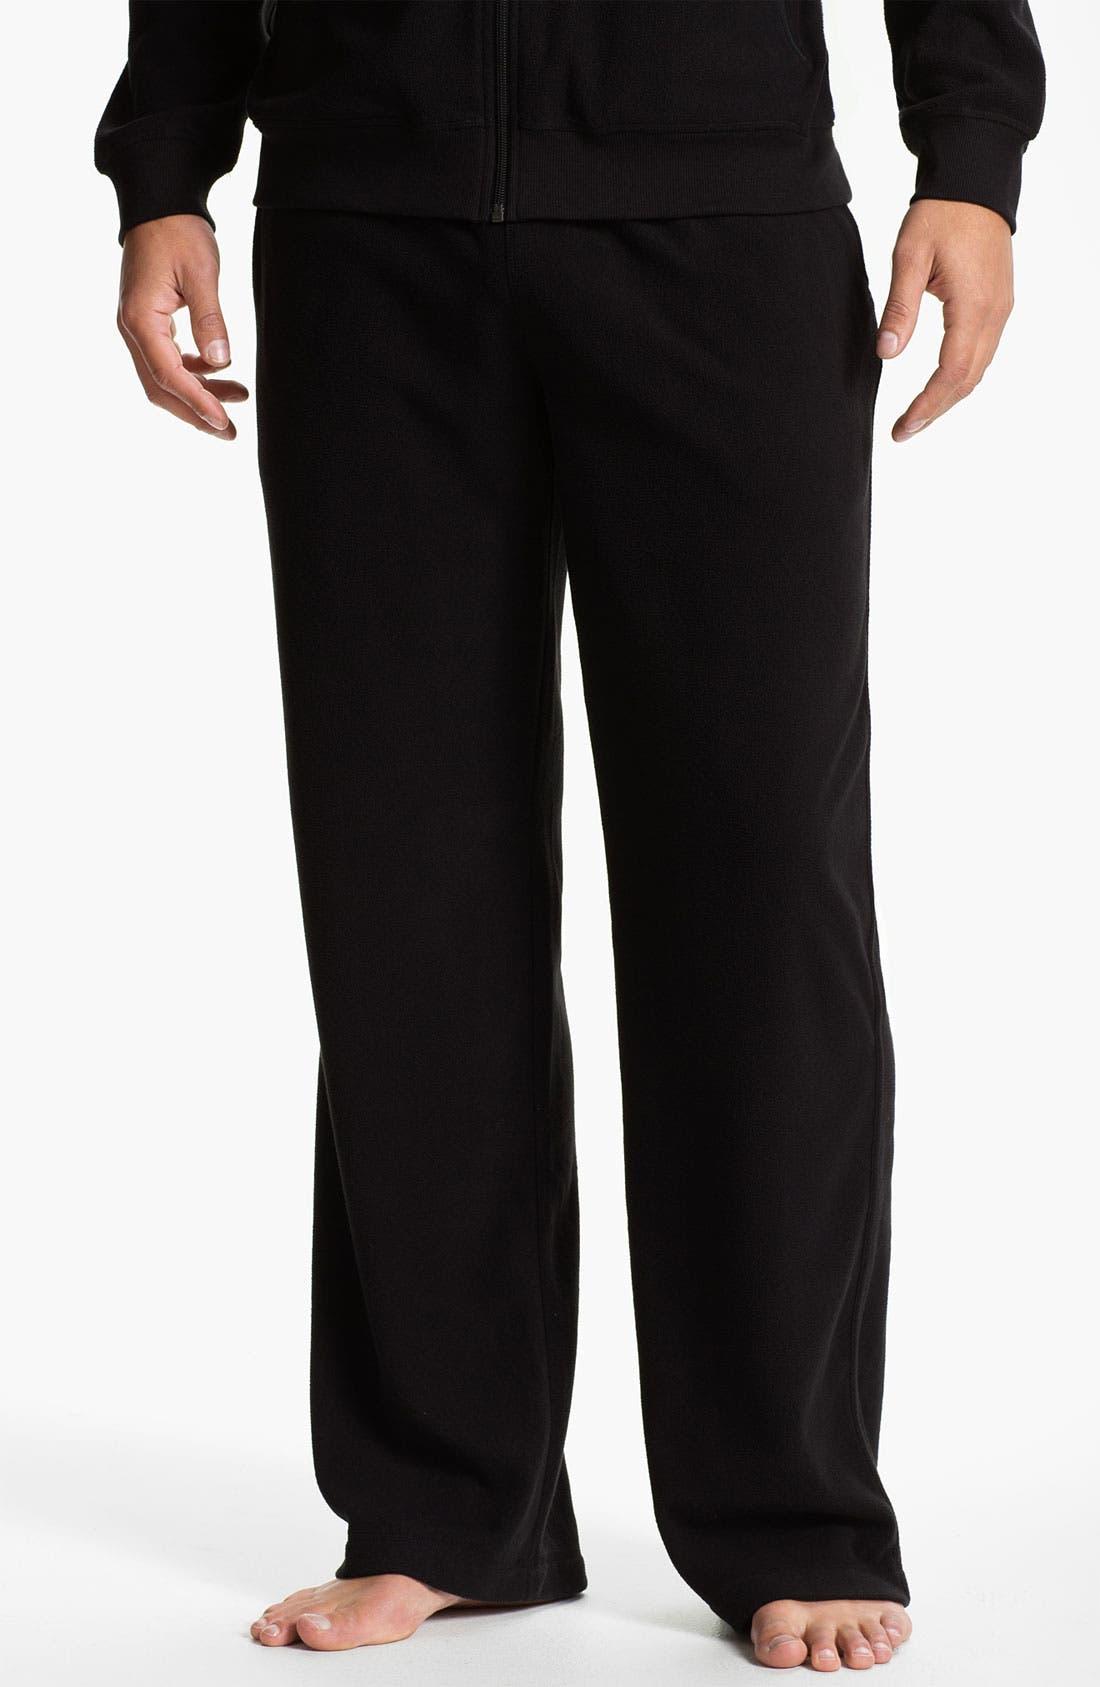 Main Image - Daniel Buchler Lightweight Fleece Lounge Pants